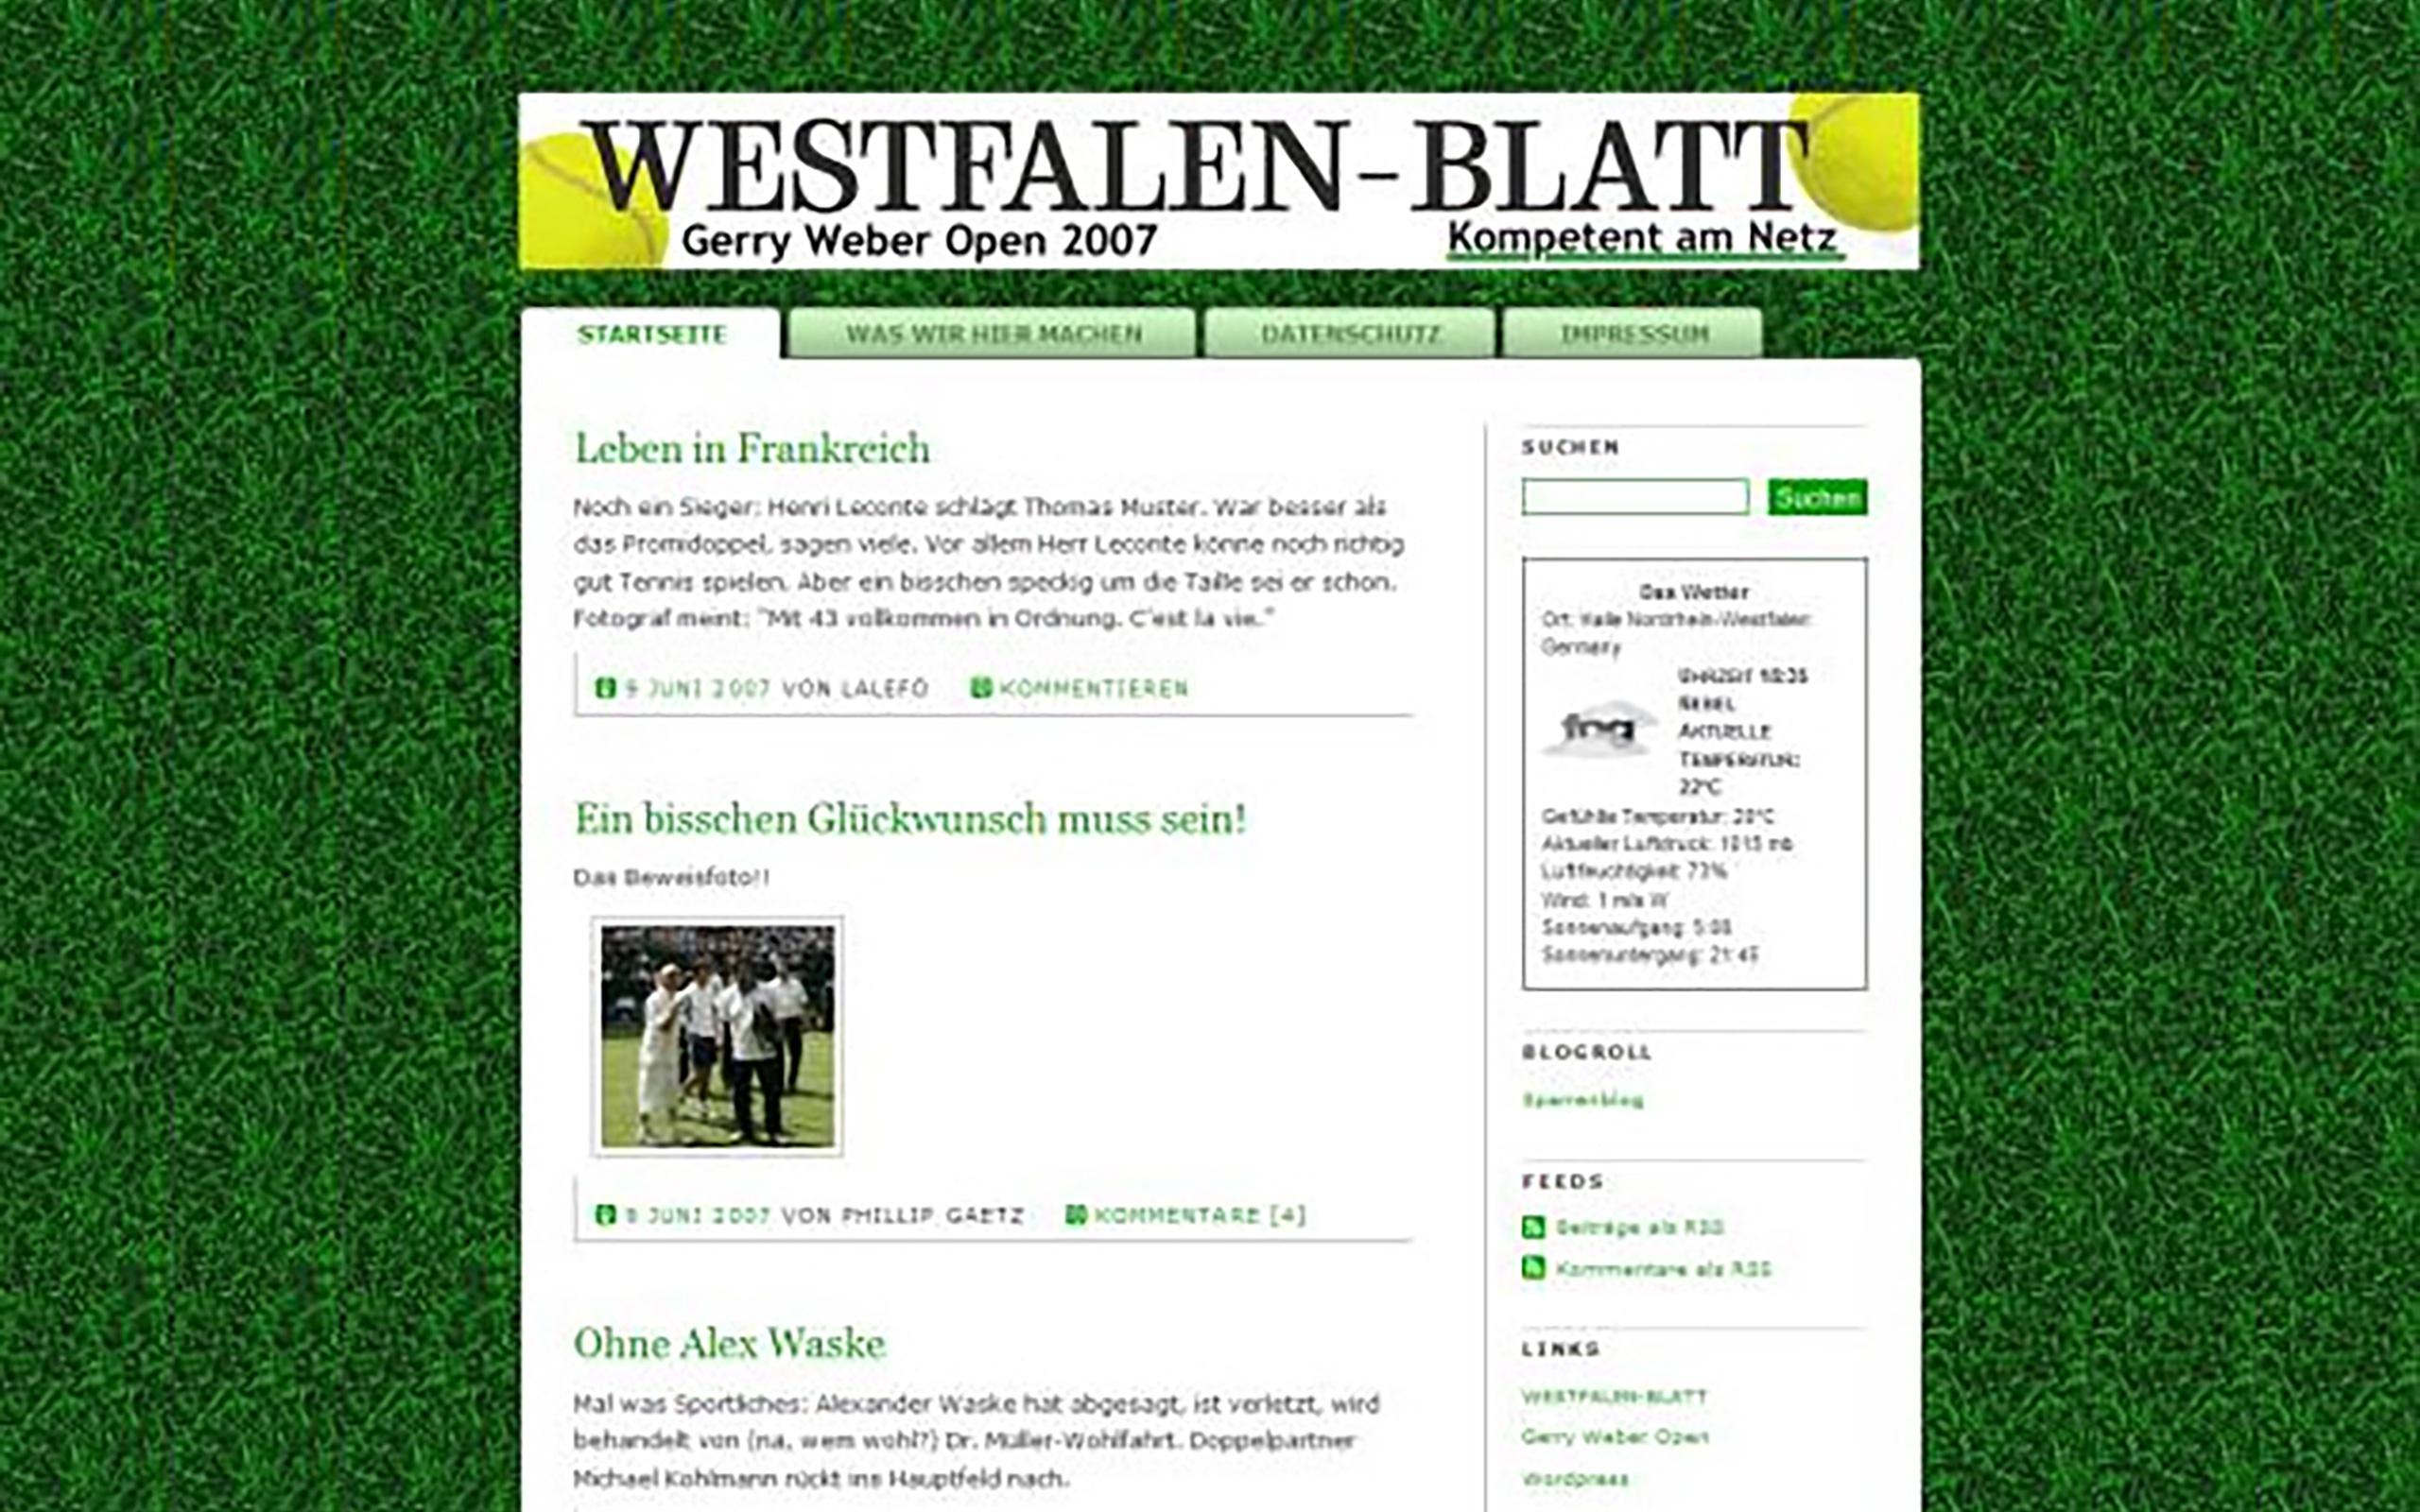 Westfalen-Blatt Gerry Weber Open